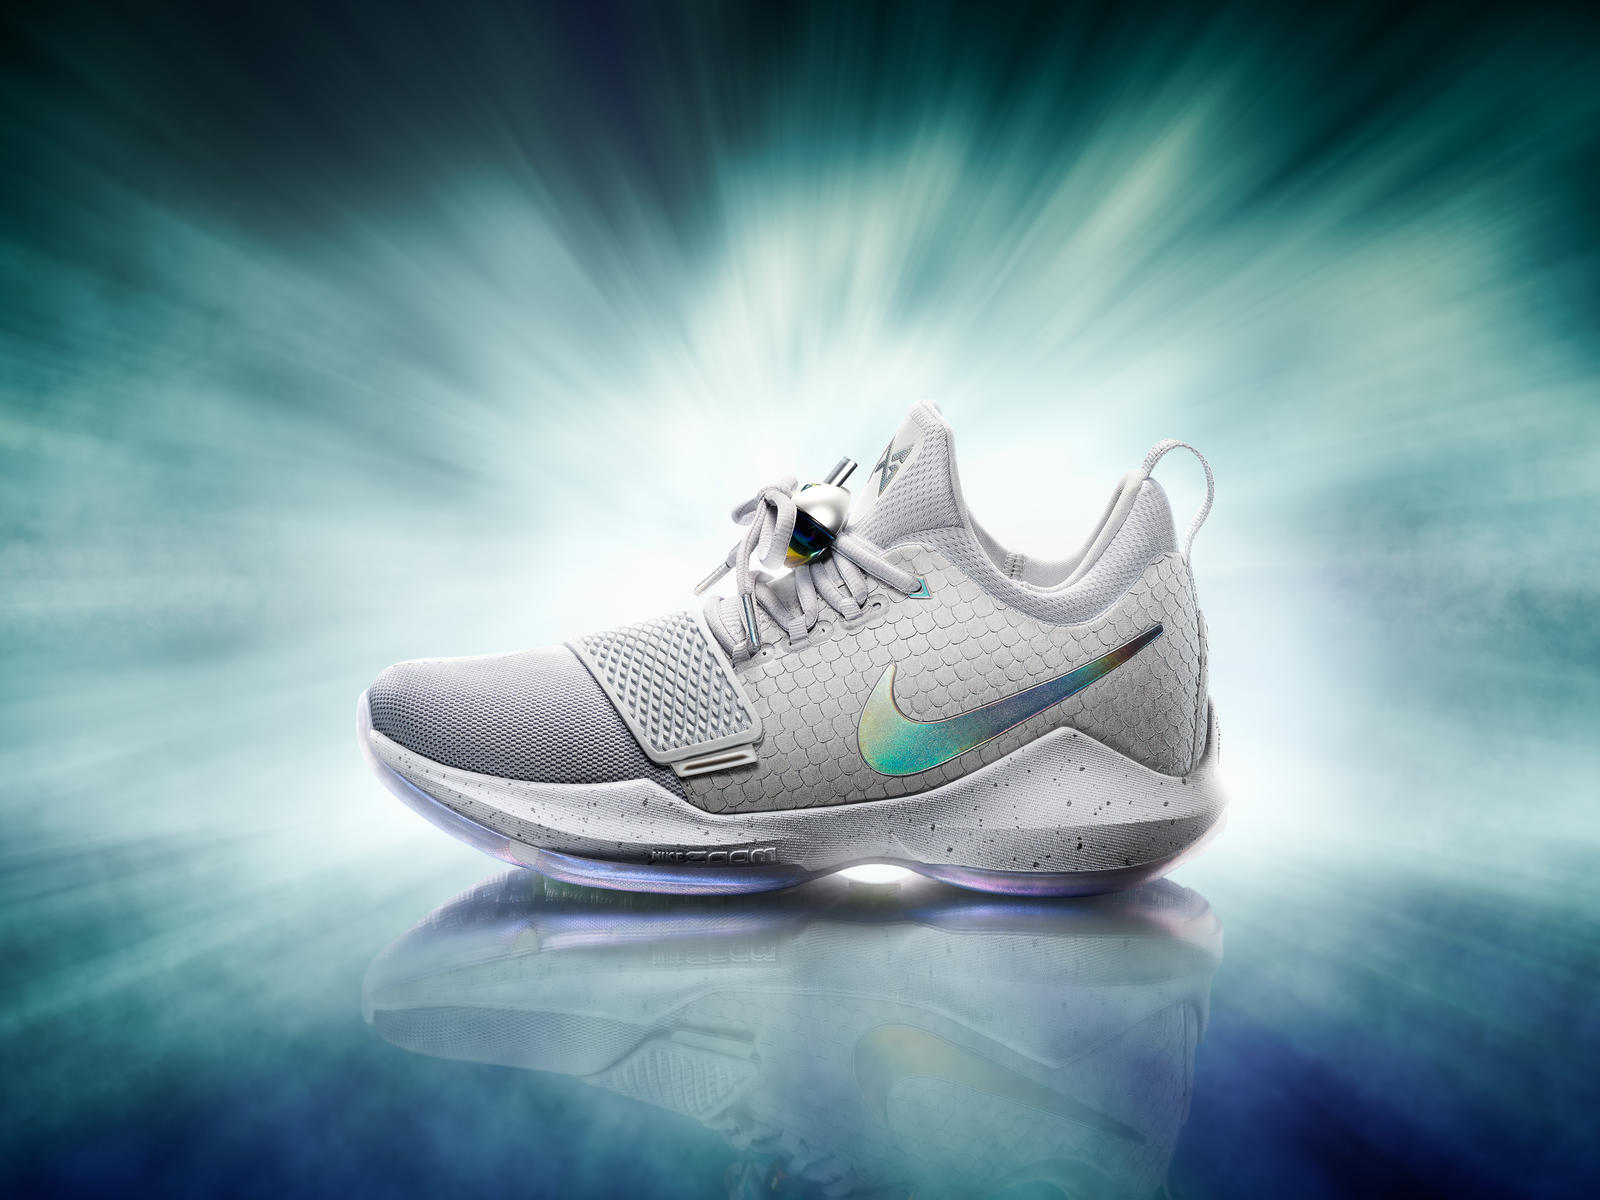 16-420_Nike_PG1_Hero_Single_Gray-03a_native_1600